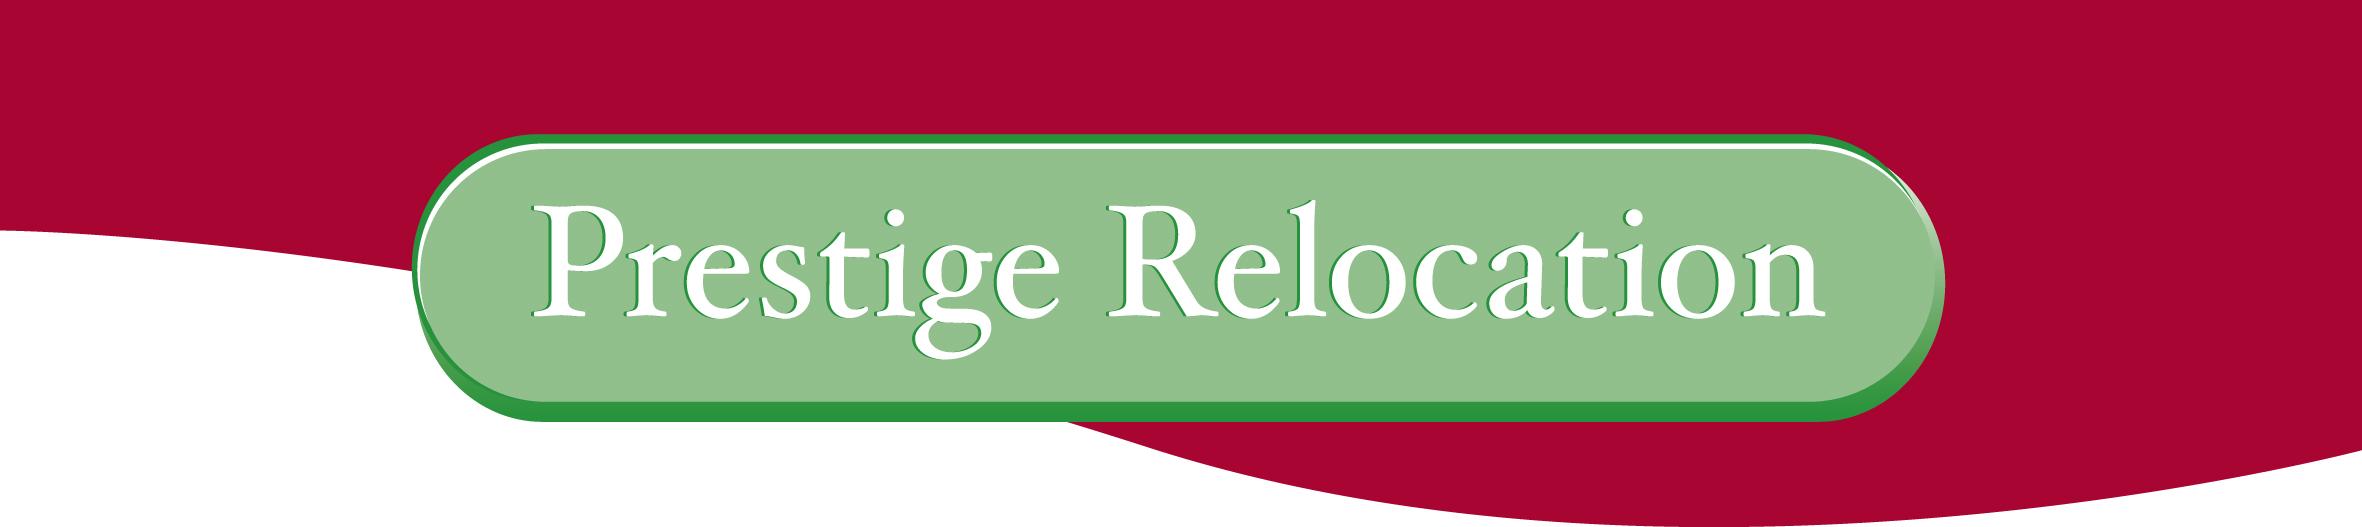 Prestige Relocation Image